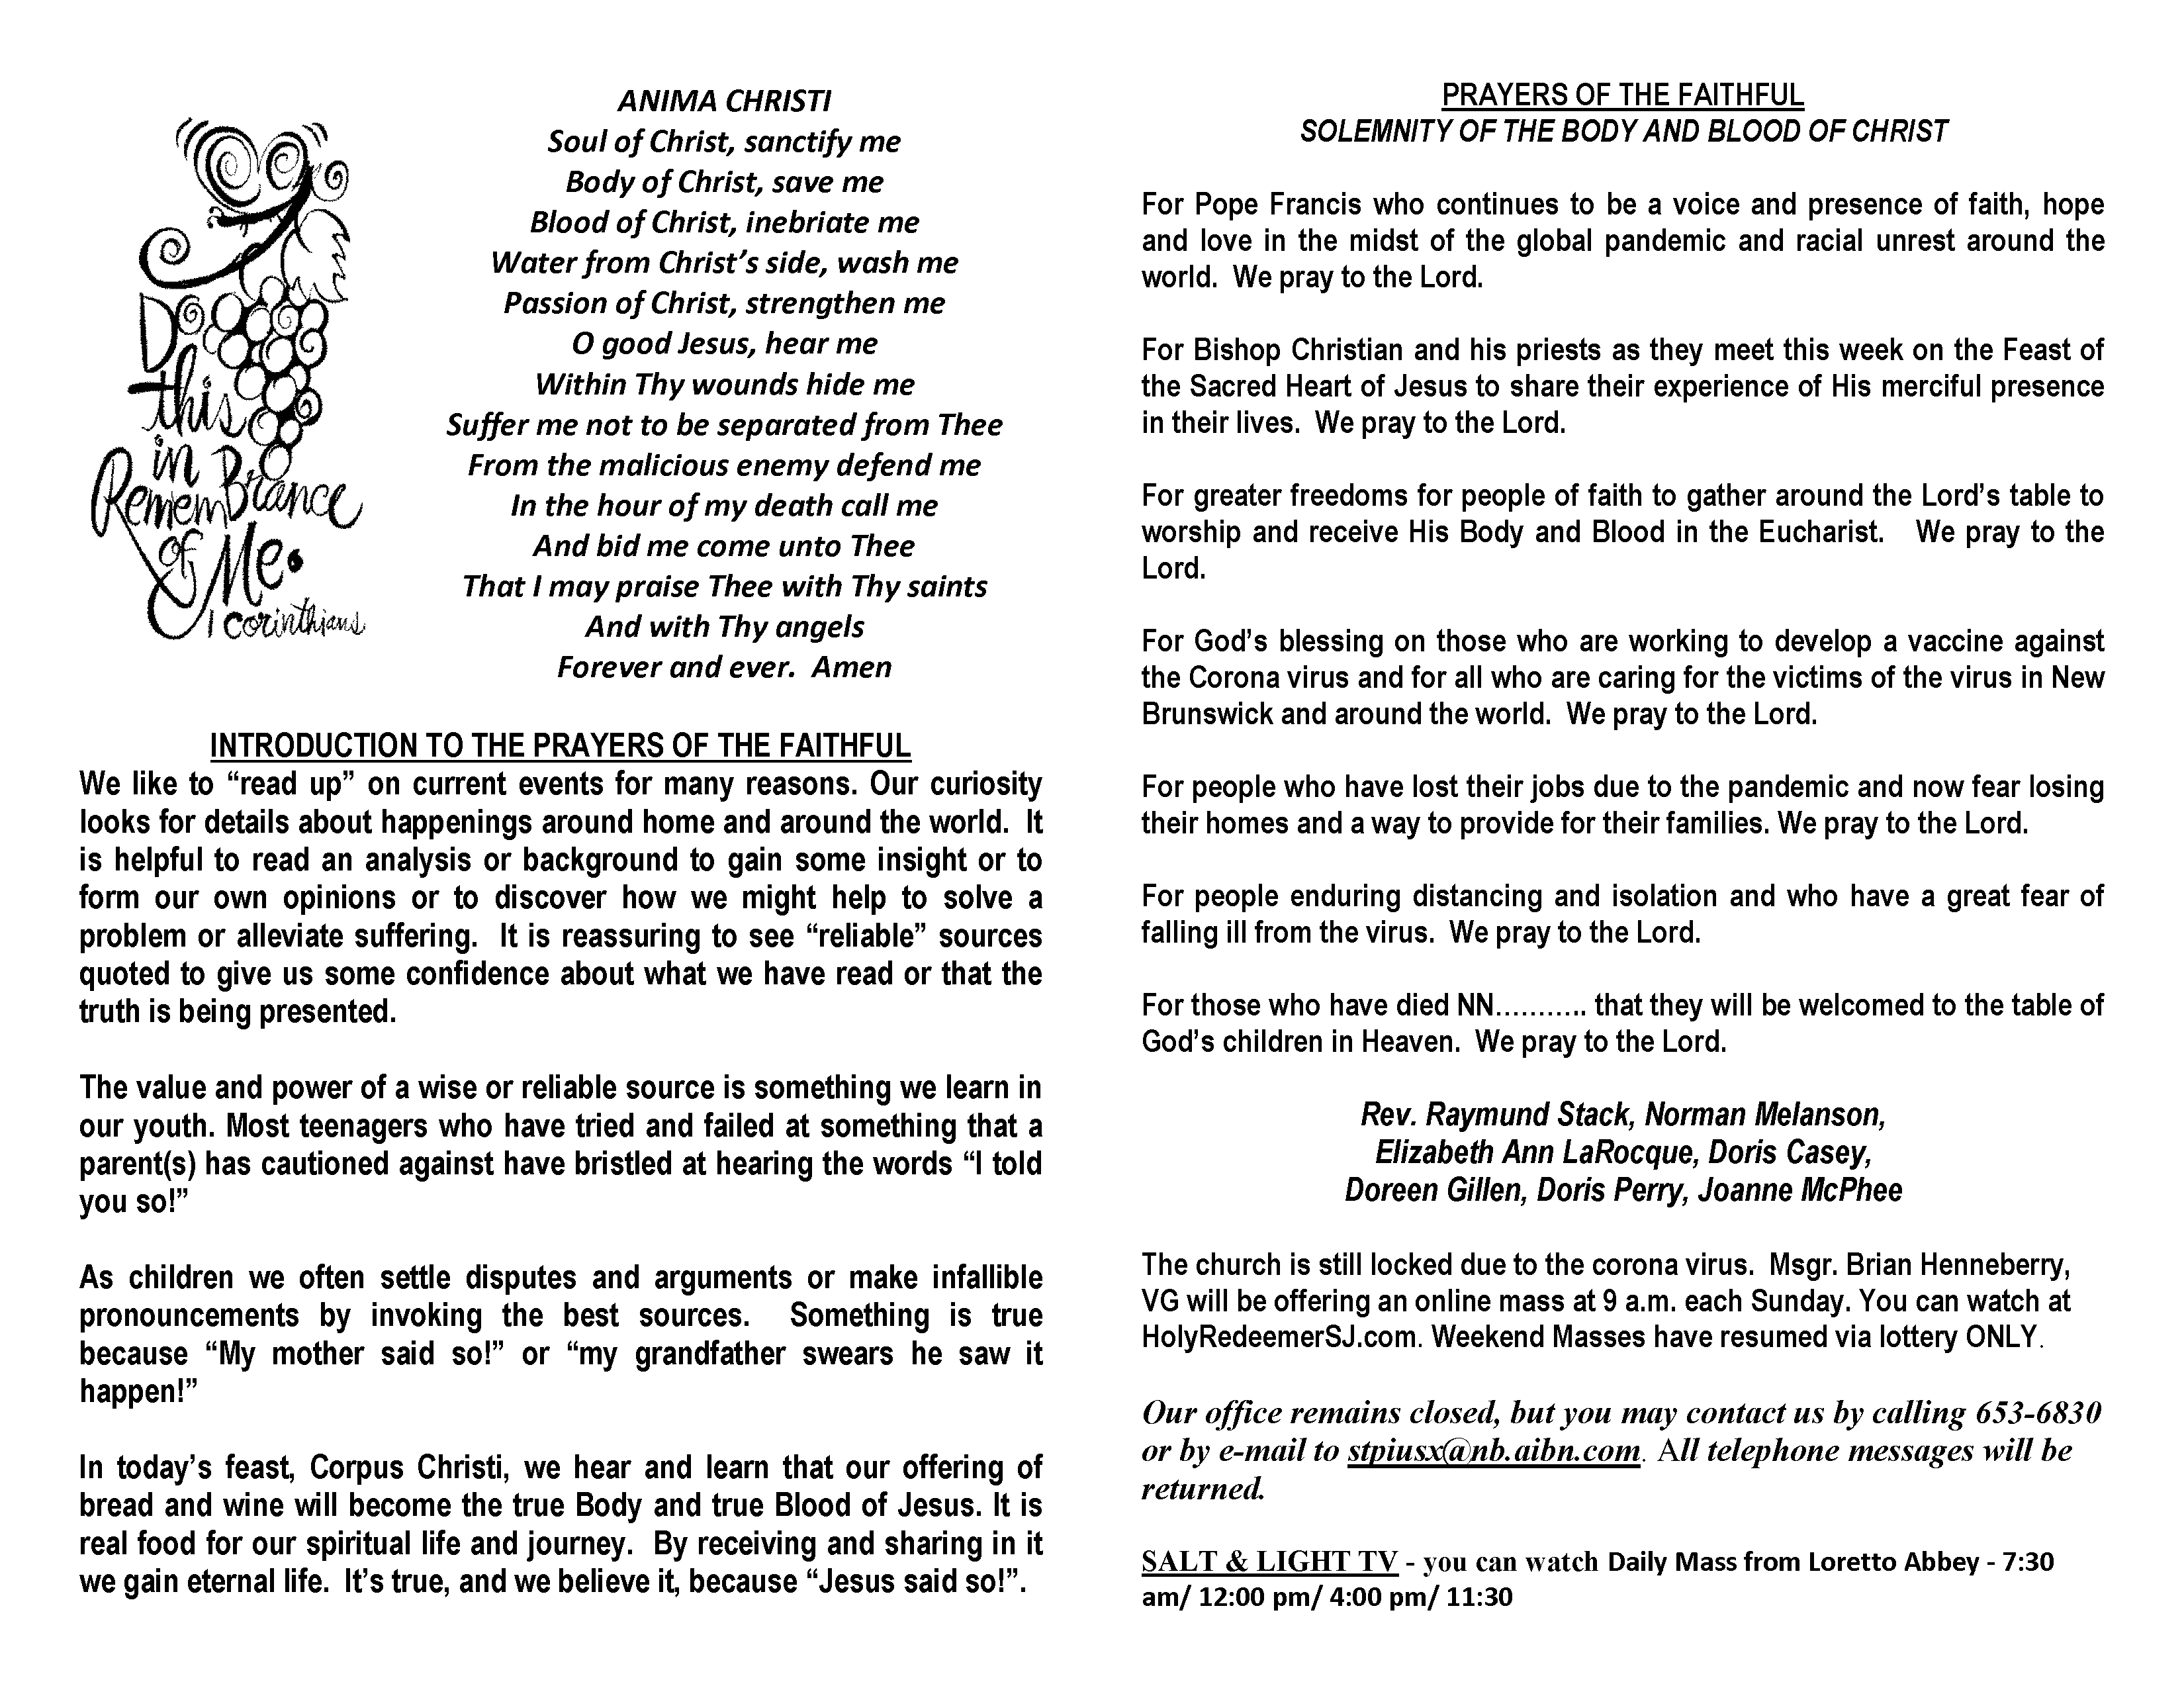 06-14-20